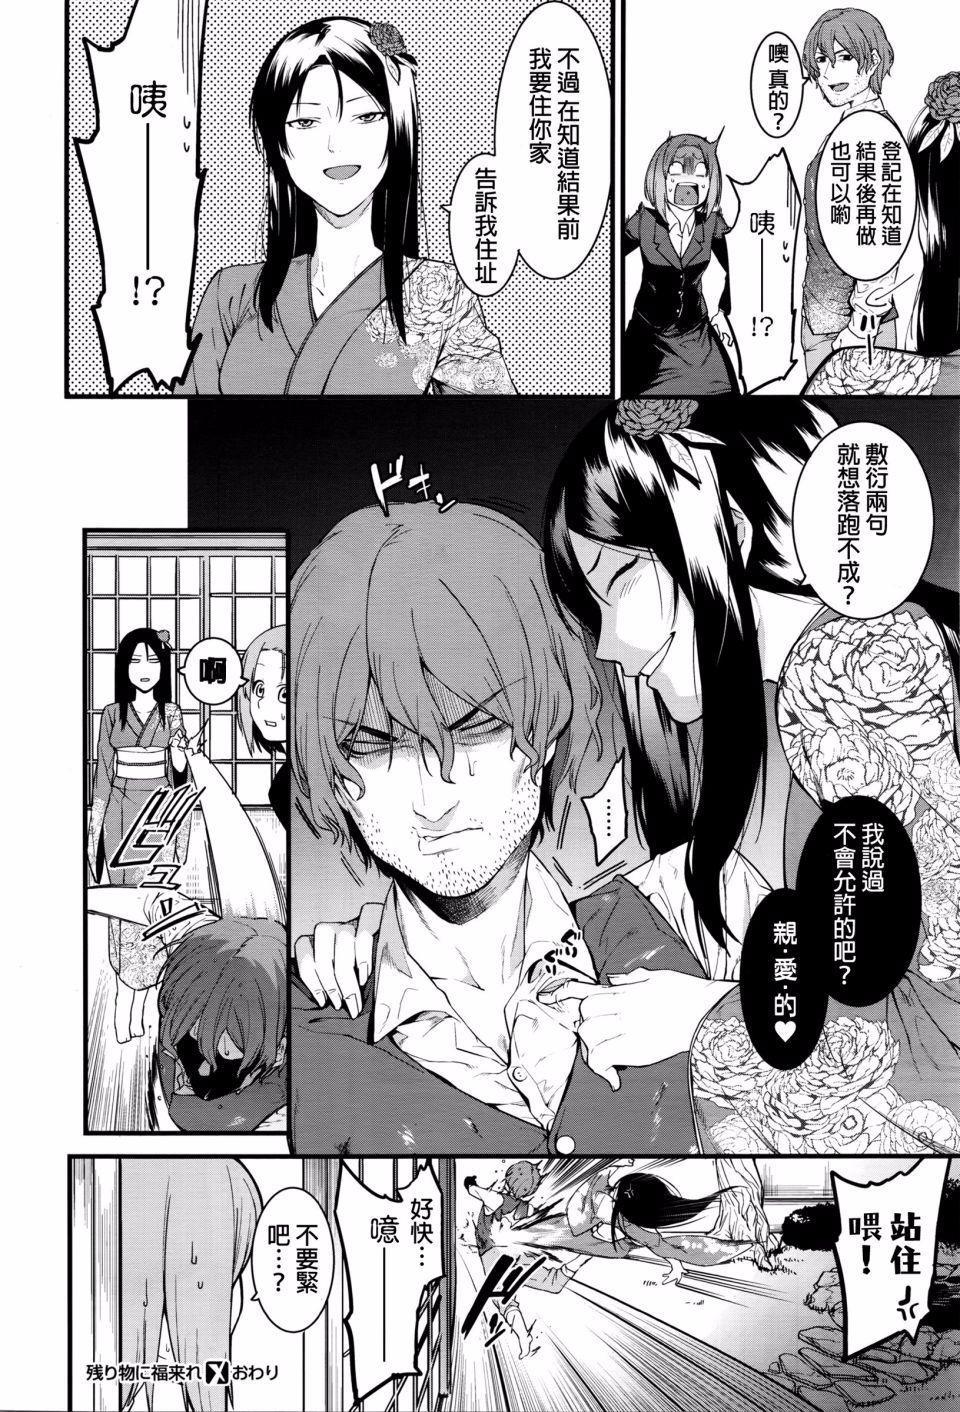 Fukurai Re to leftovers 23